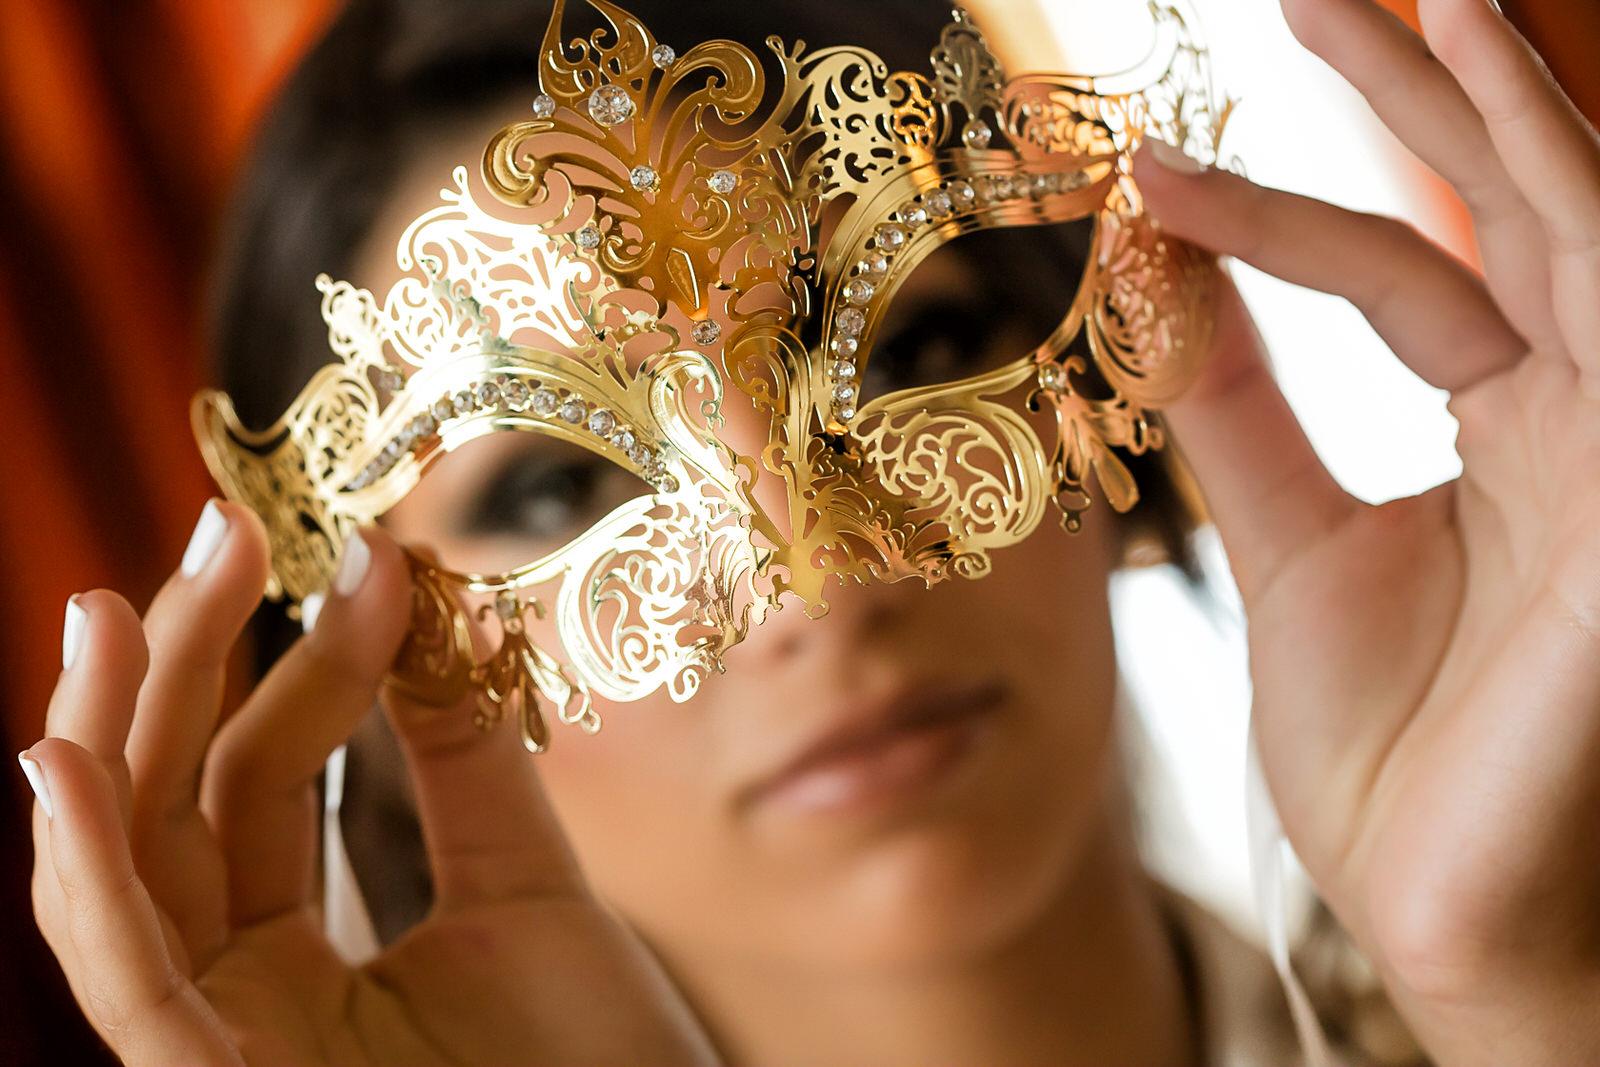 It's a Masquerade!